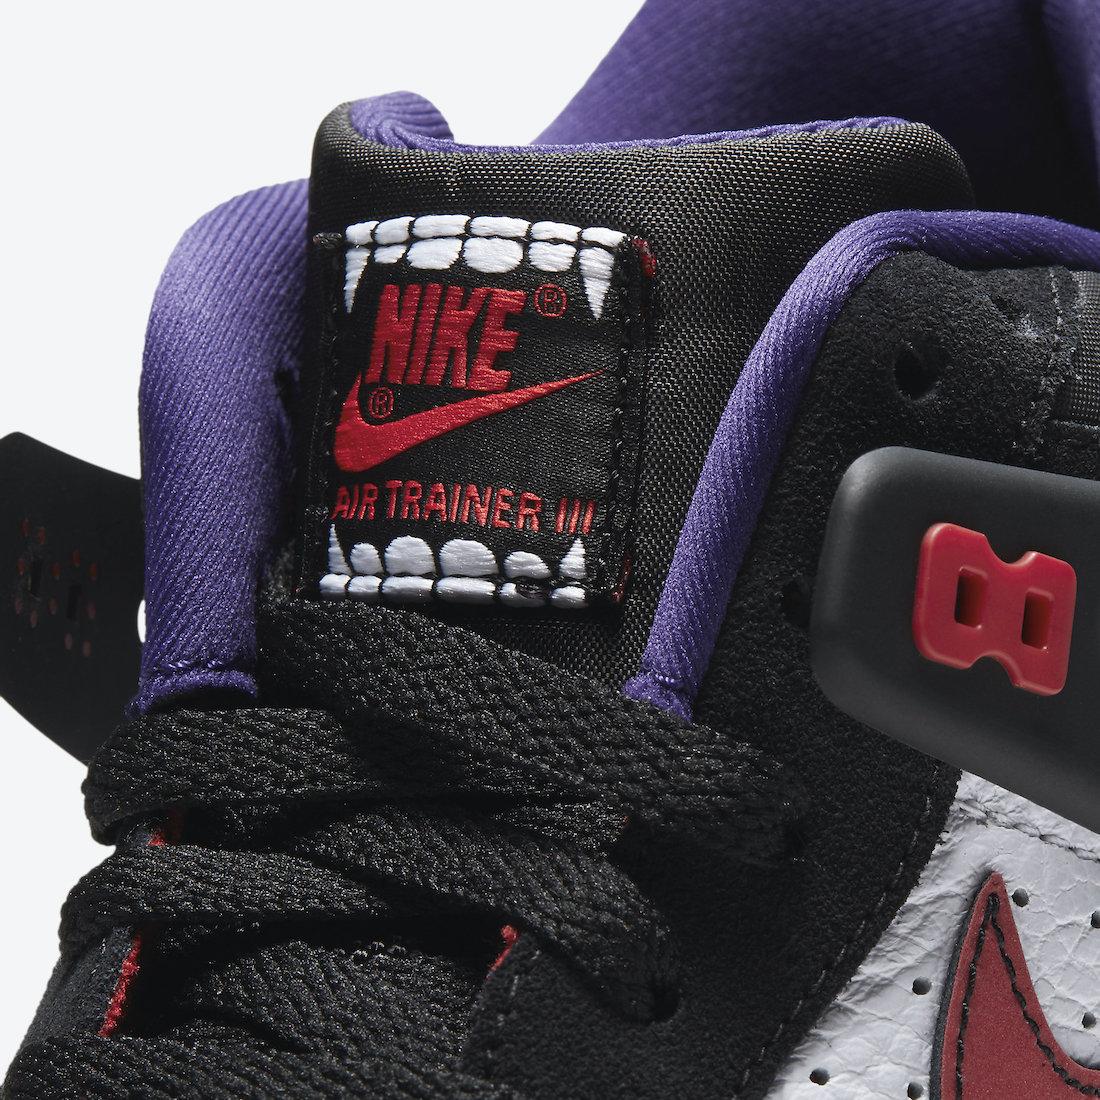 Nike-Air-Trainer-3-Dracula-DC1501-001-Release-Date-6